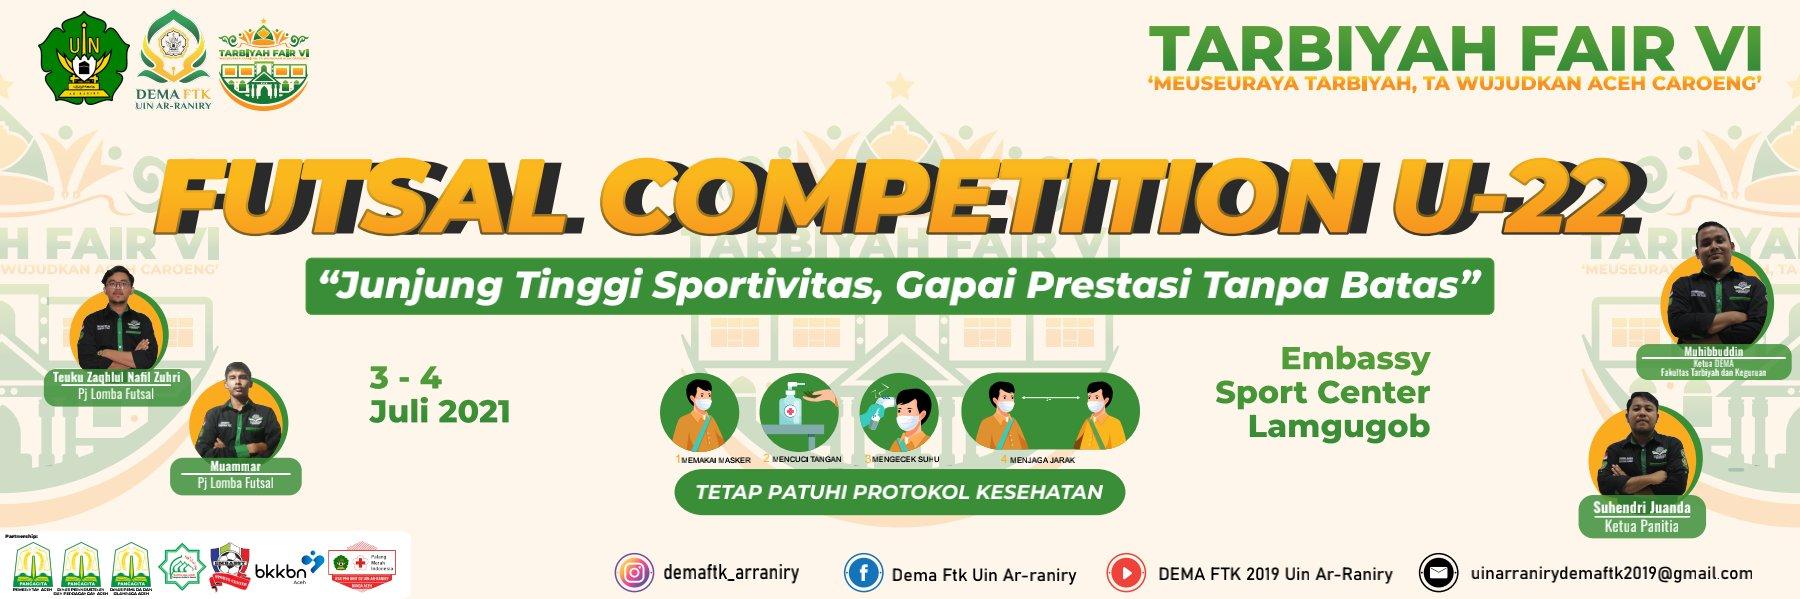 Dewan Eksekutif Mahasiswa Fakultas Tarbiyah Dan Keguruan Uin Ar Raniry Banda Aceh Selenggarakan Futsal Competition U 22